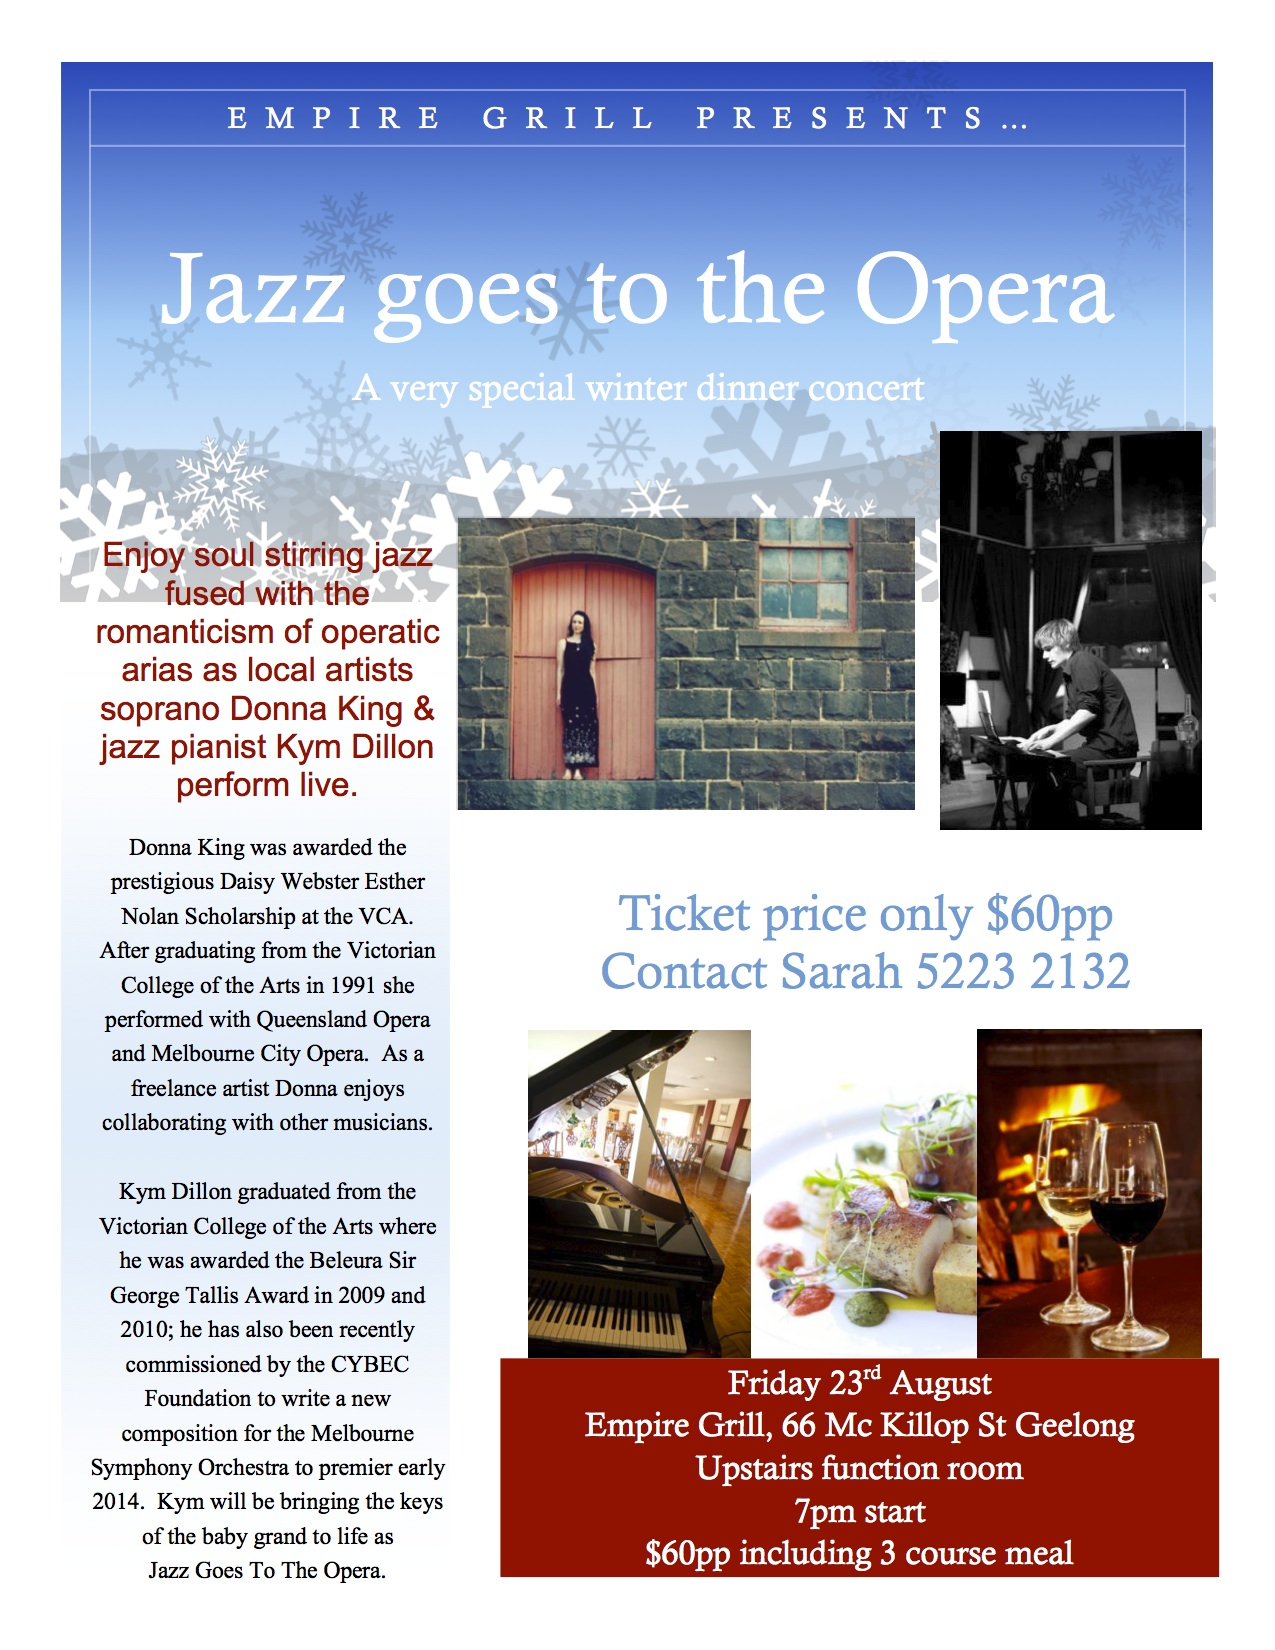 jazz goes to the opera.jpg